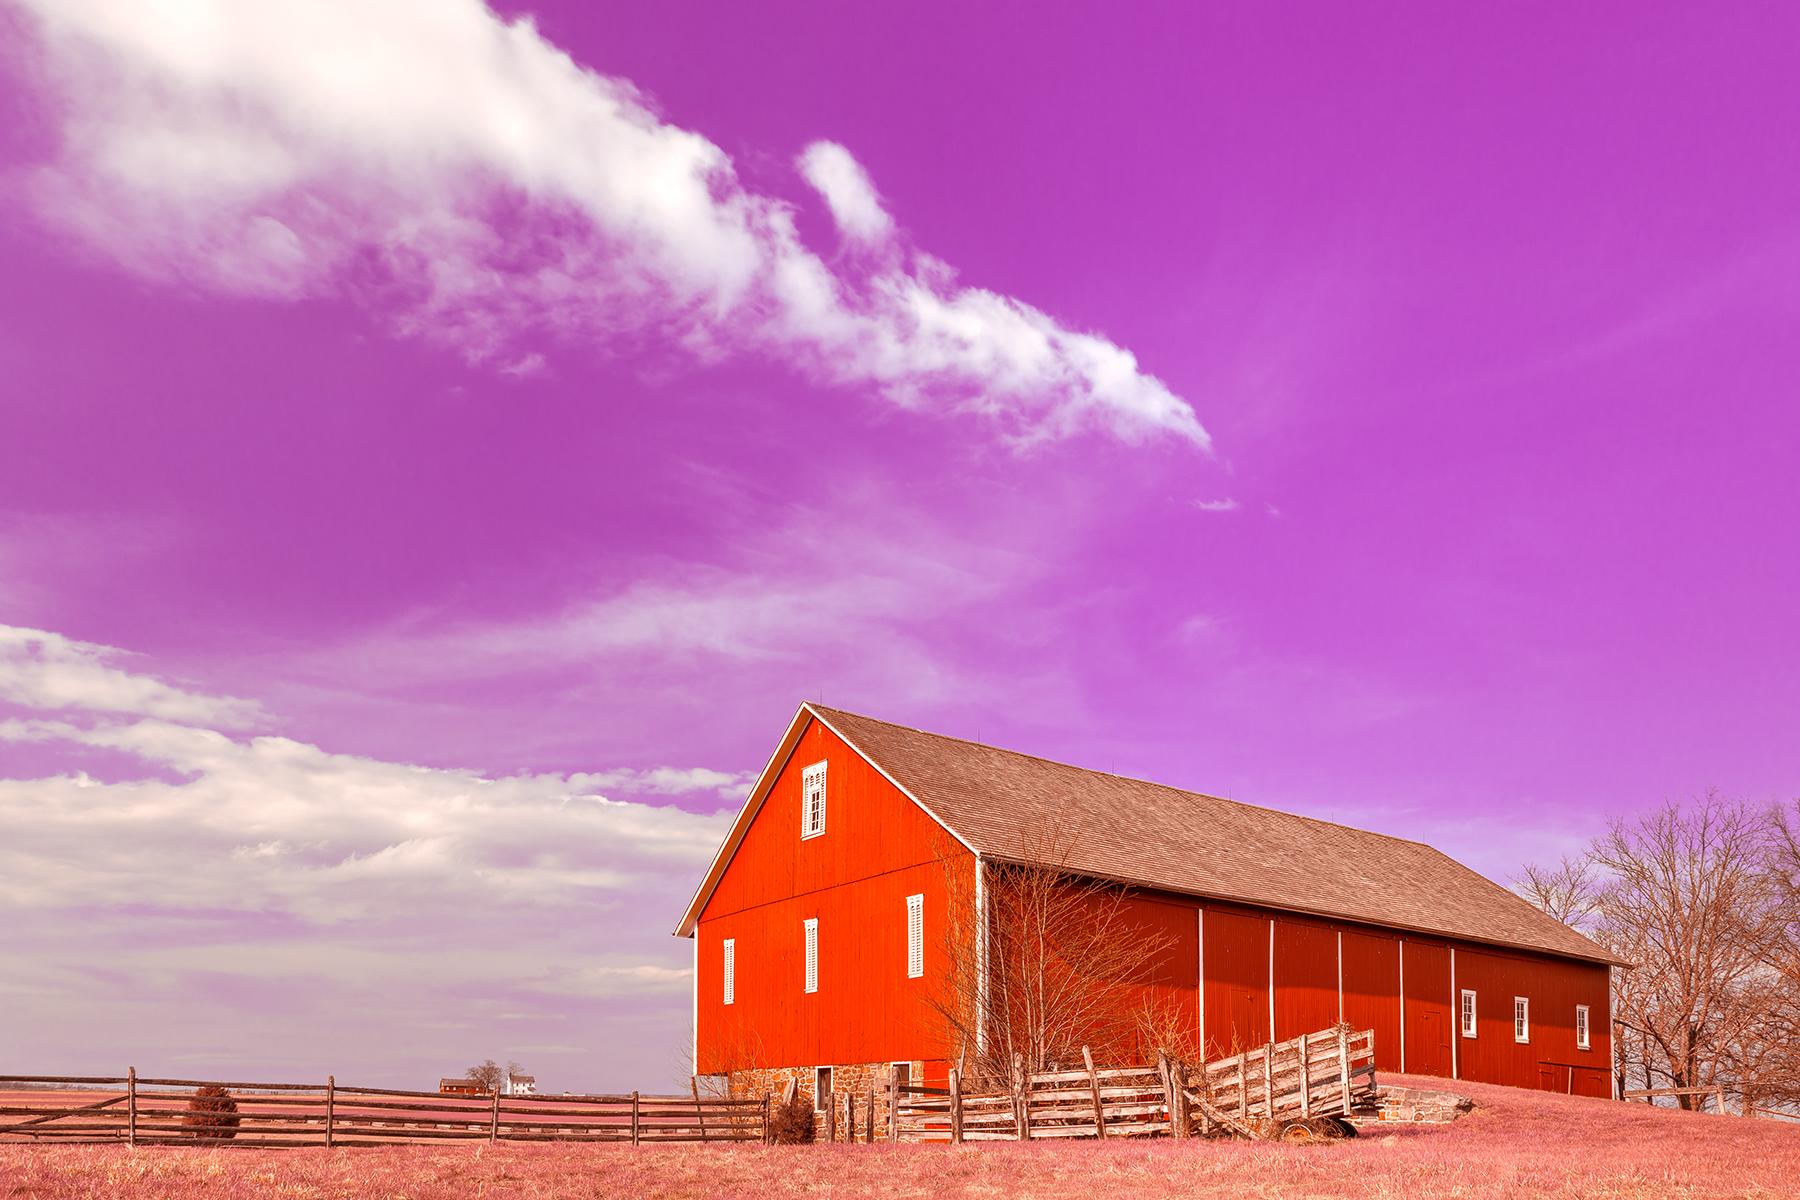 Spangler house farm - candy fantasy hdr photo